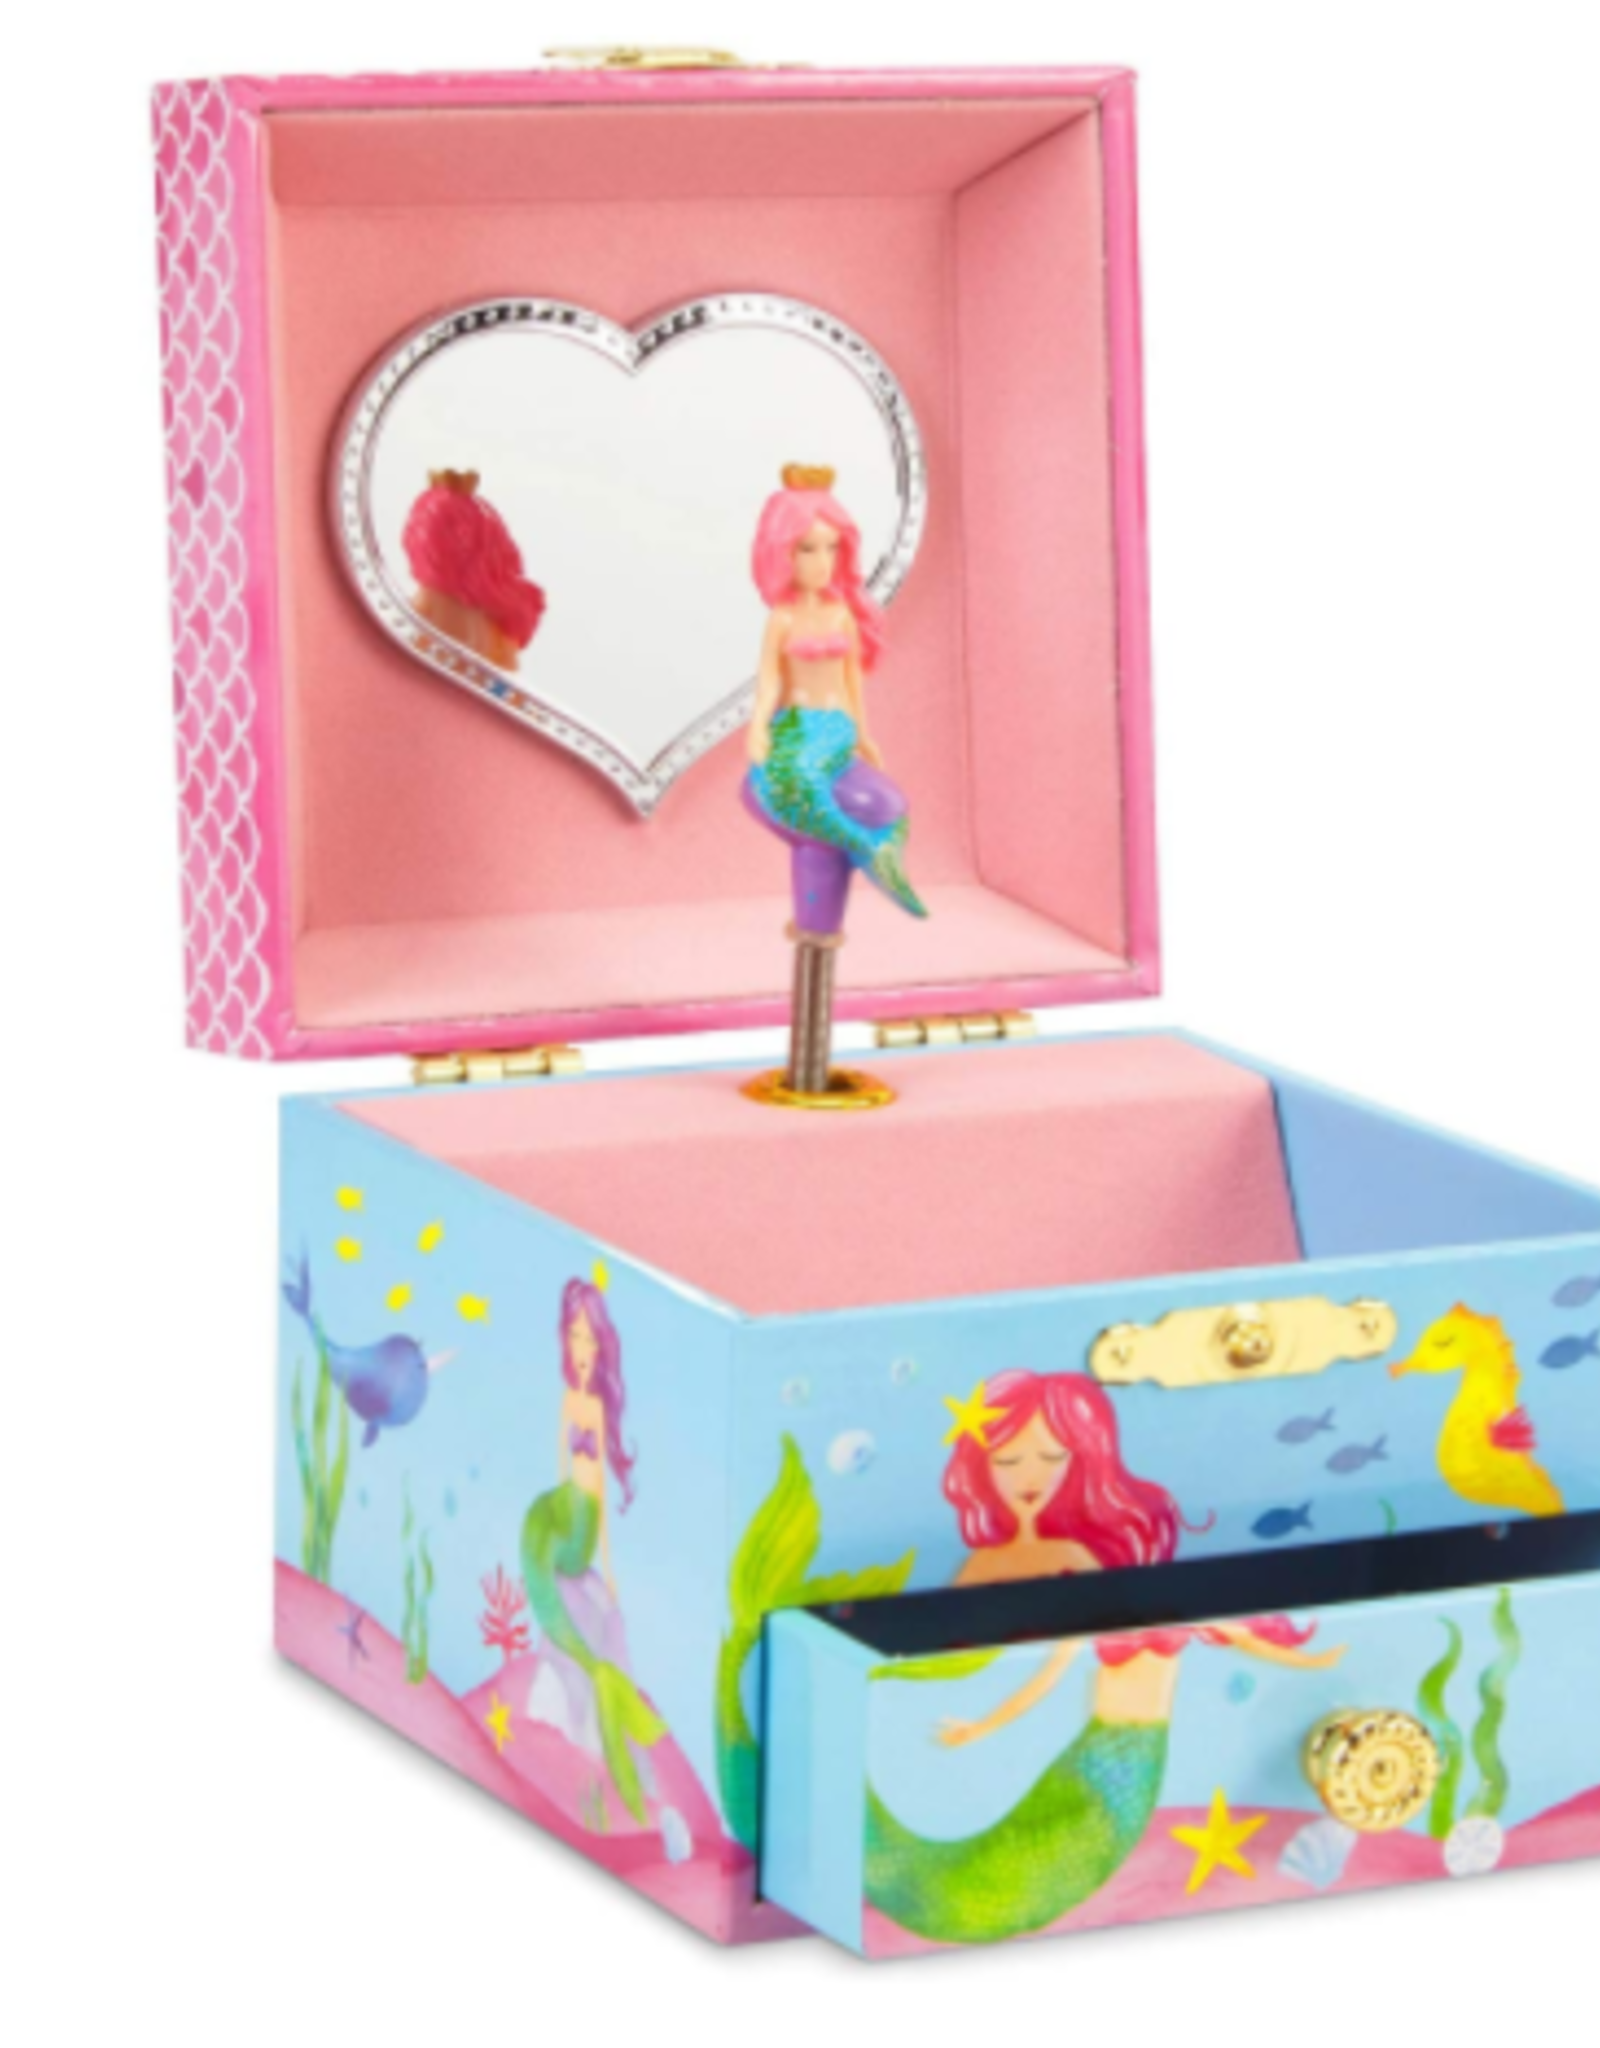 Jewelkeeper Musical Jewelry Box Mermaid 2